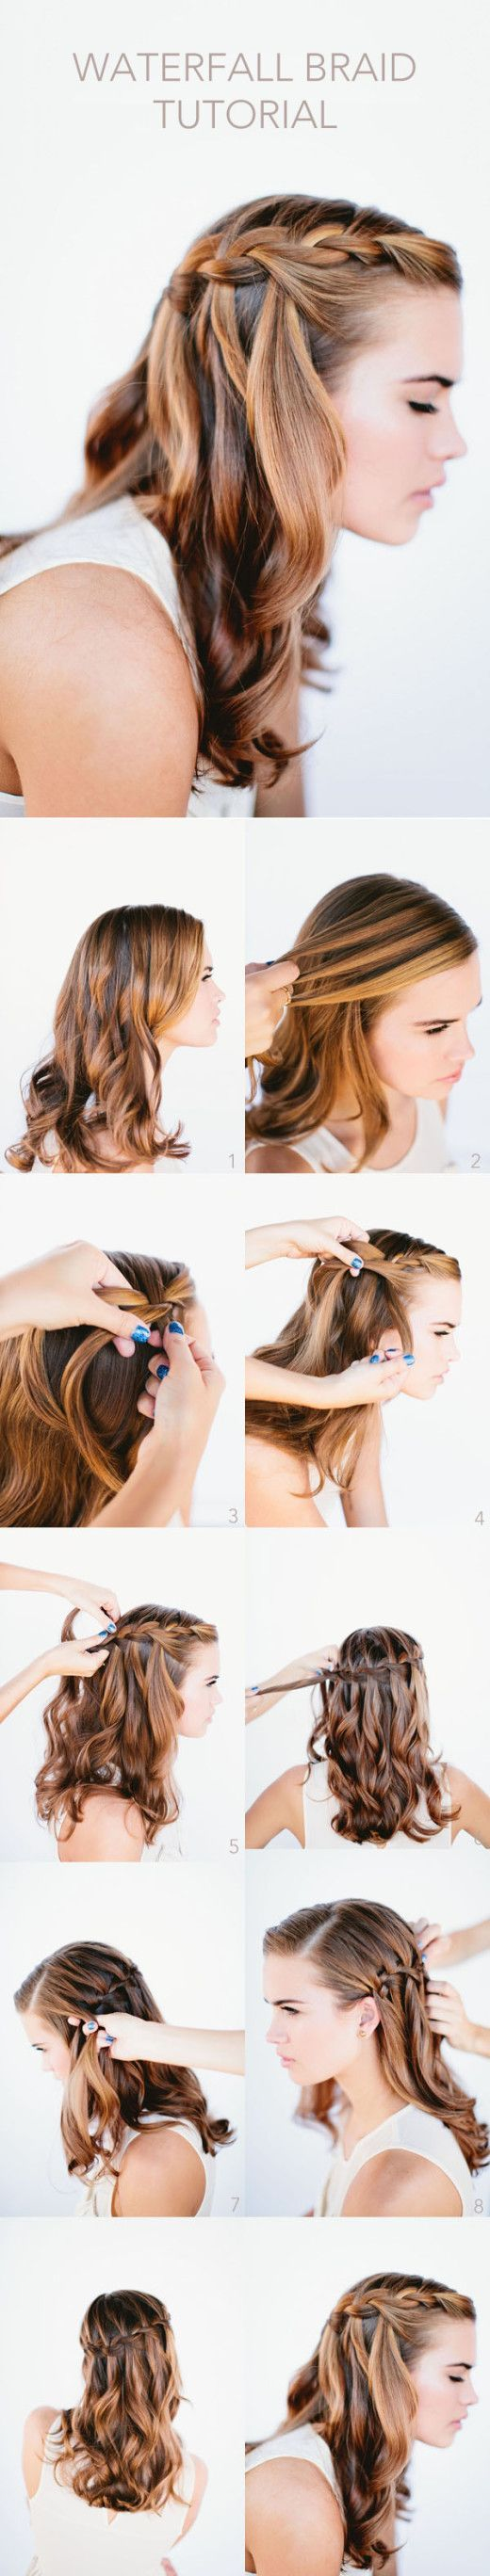 Waterfall Braid Wedding Hairstyles for Long Hair -- looks so simple....